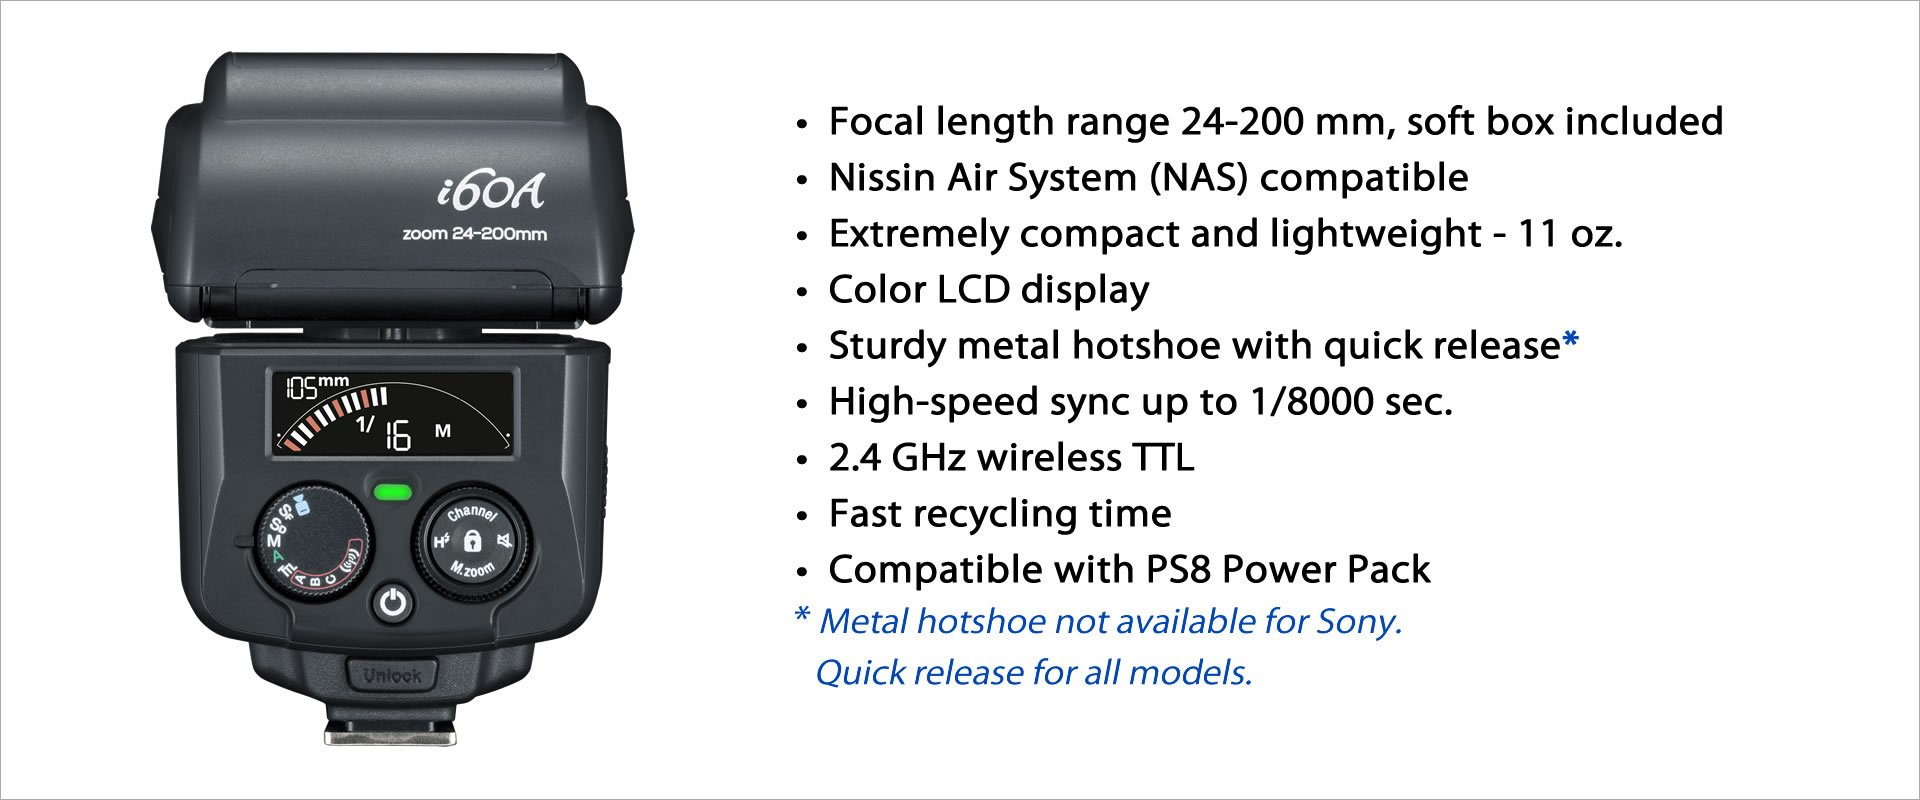 Nissin i60 a Flash para cámaras Sony: NISSIN: Amazon.es: Electrónica